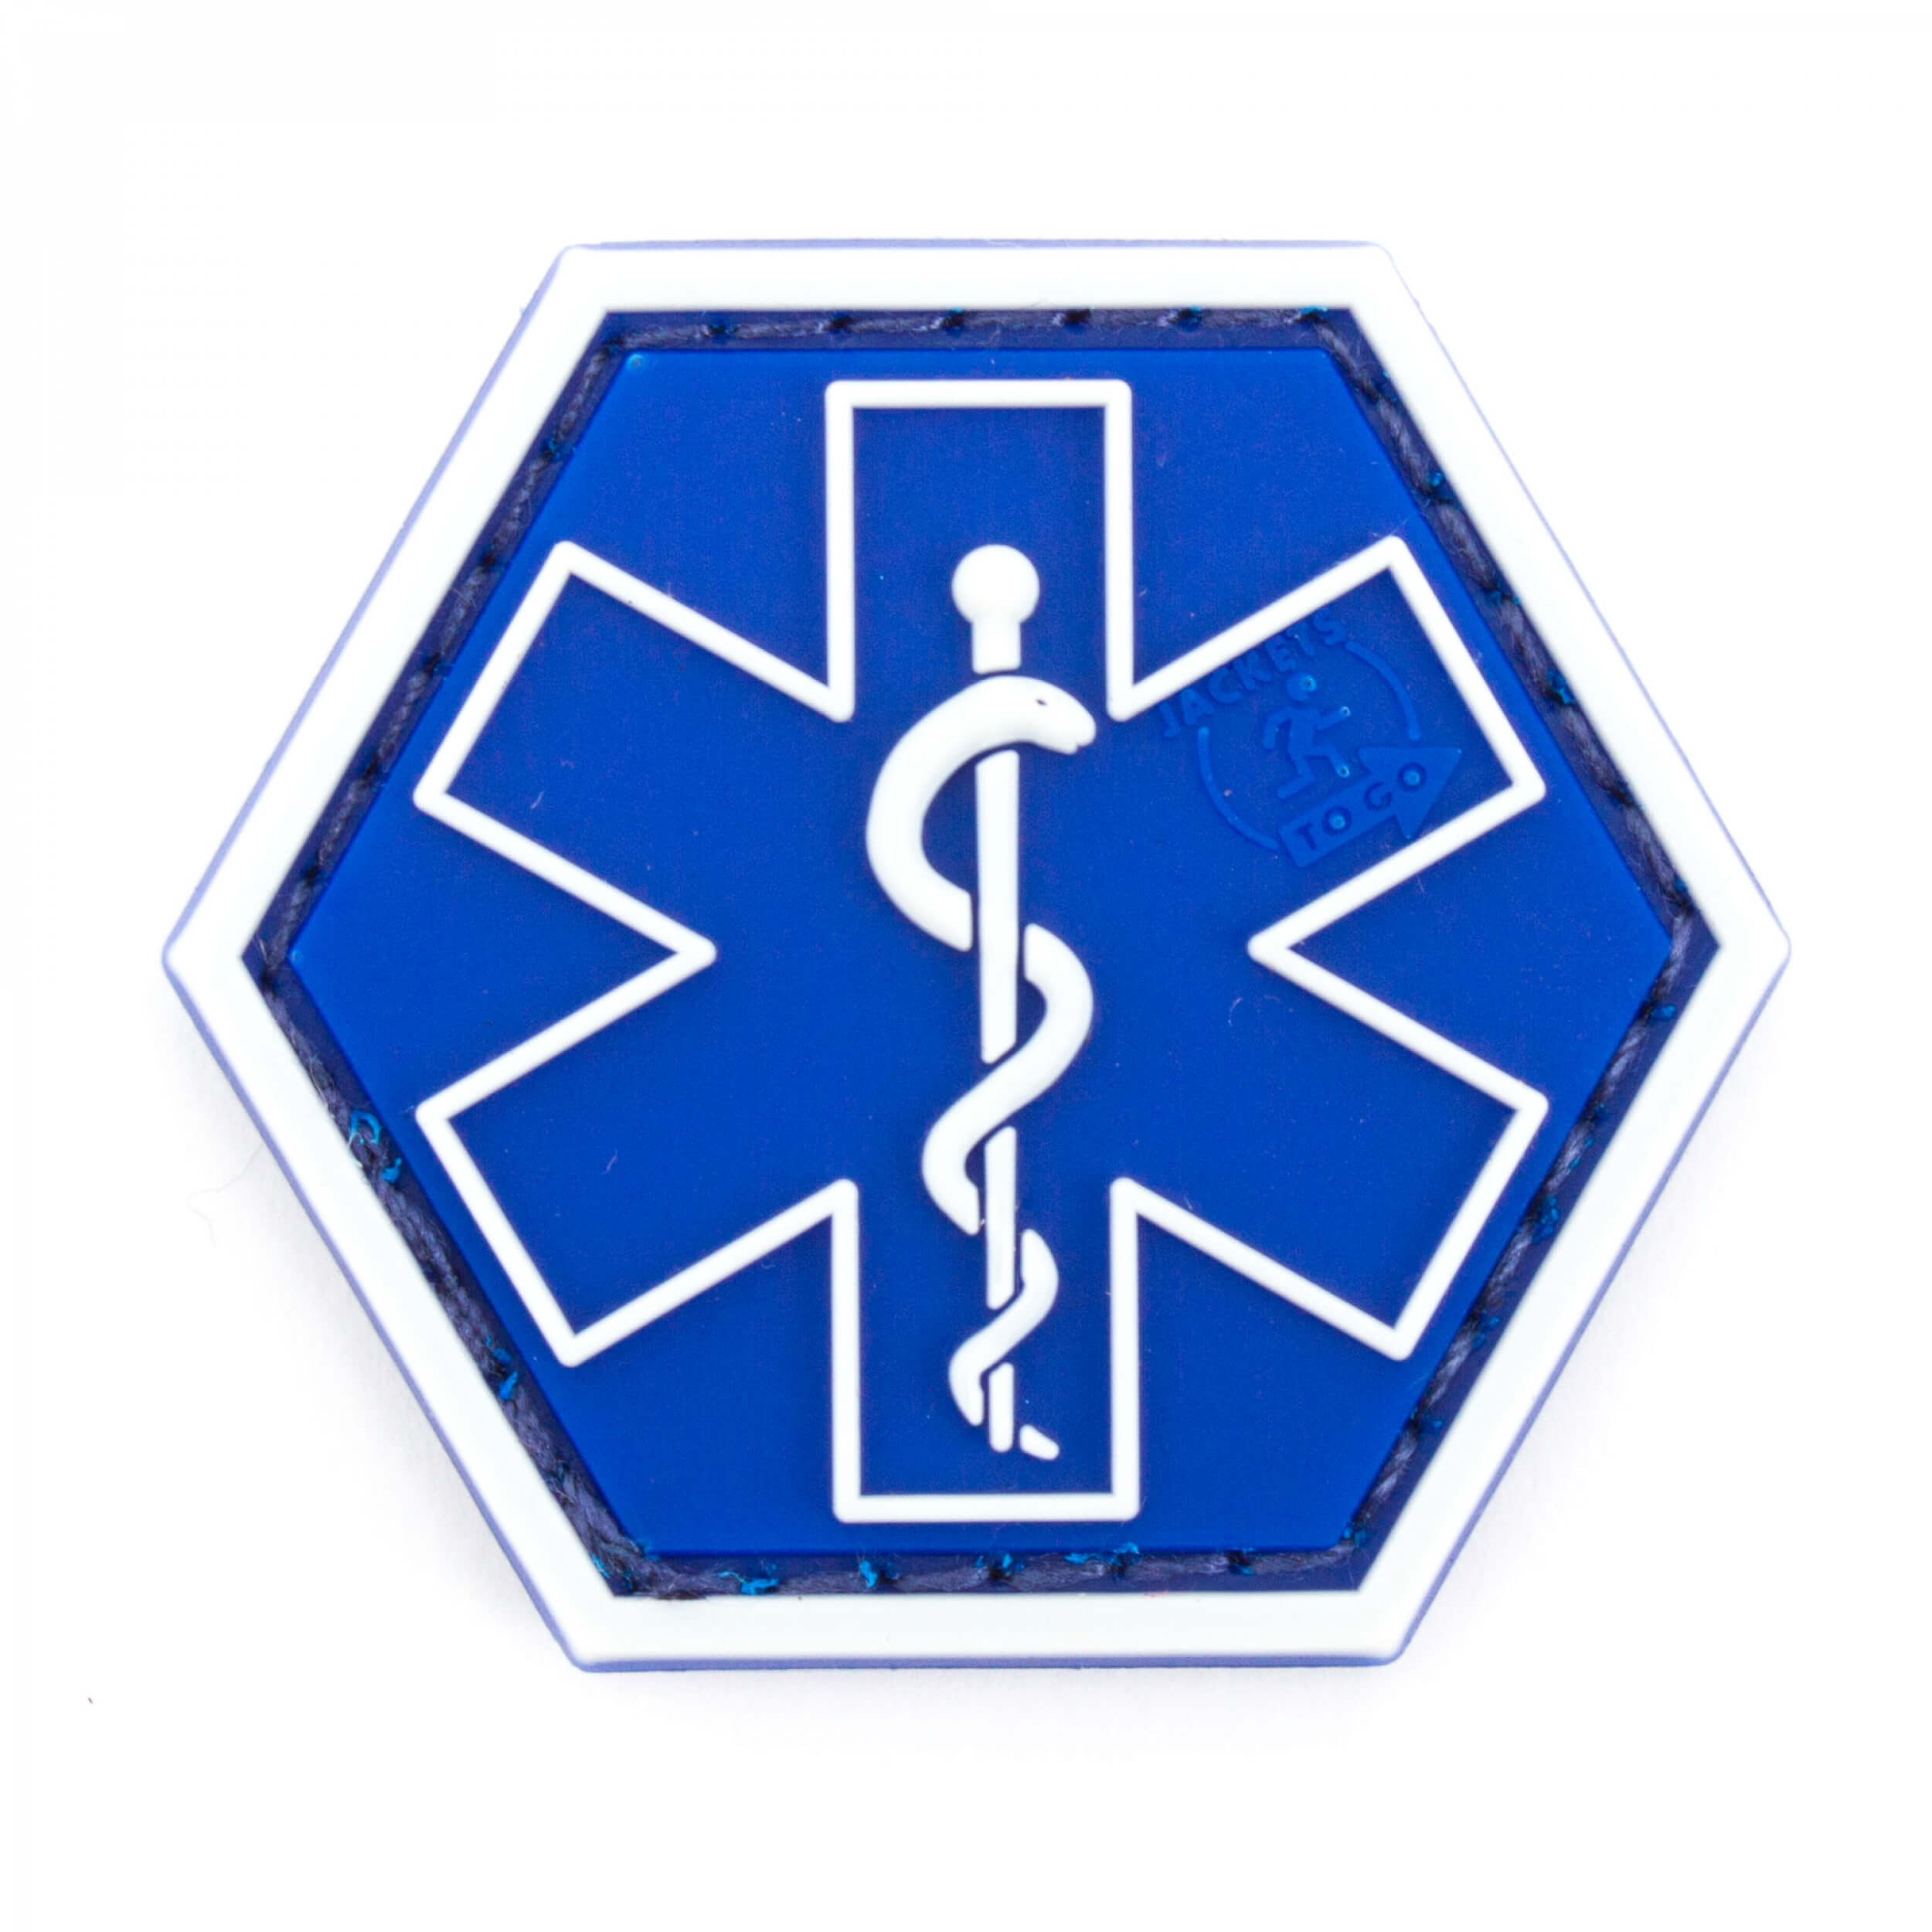 JTG PARAMEDIC, blau Hexagon Patch   (gb)